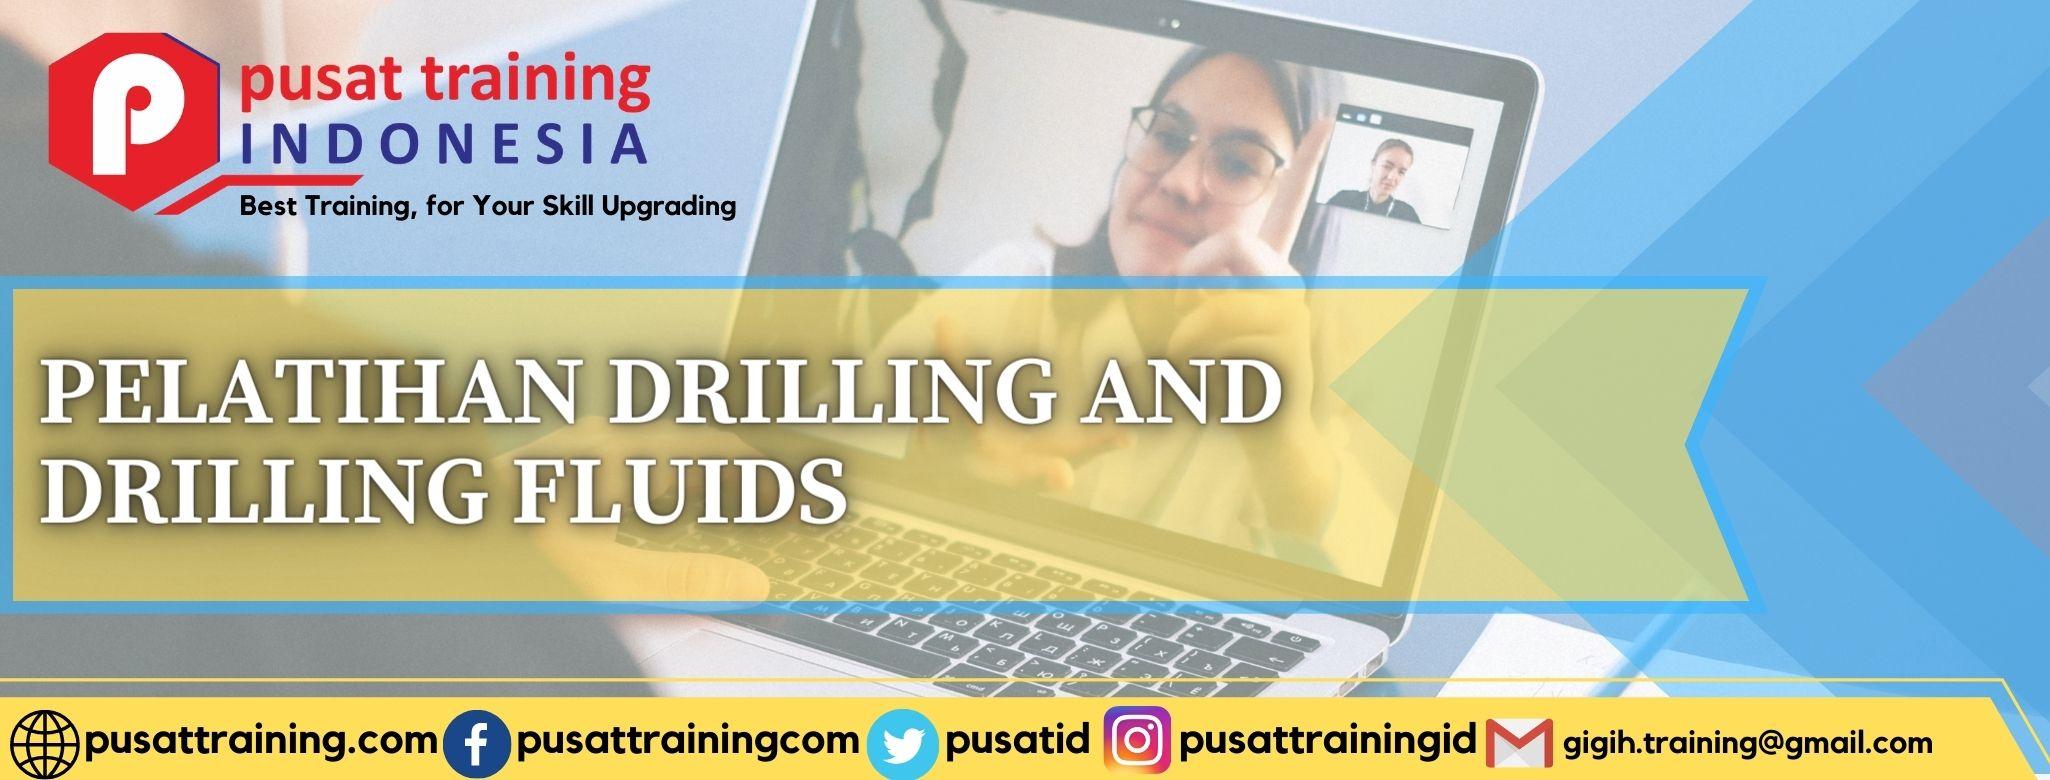 pelatihan-drilling-and-drilling-fluids